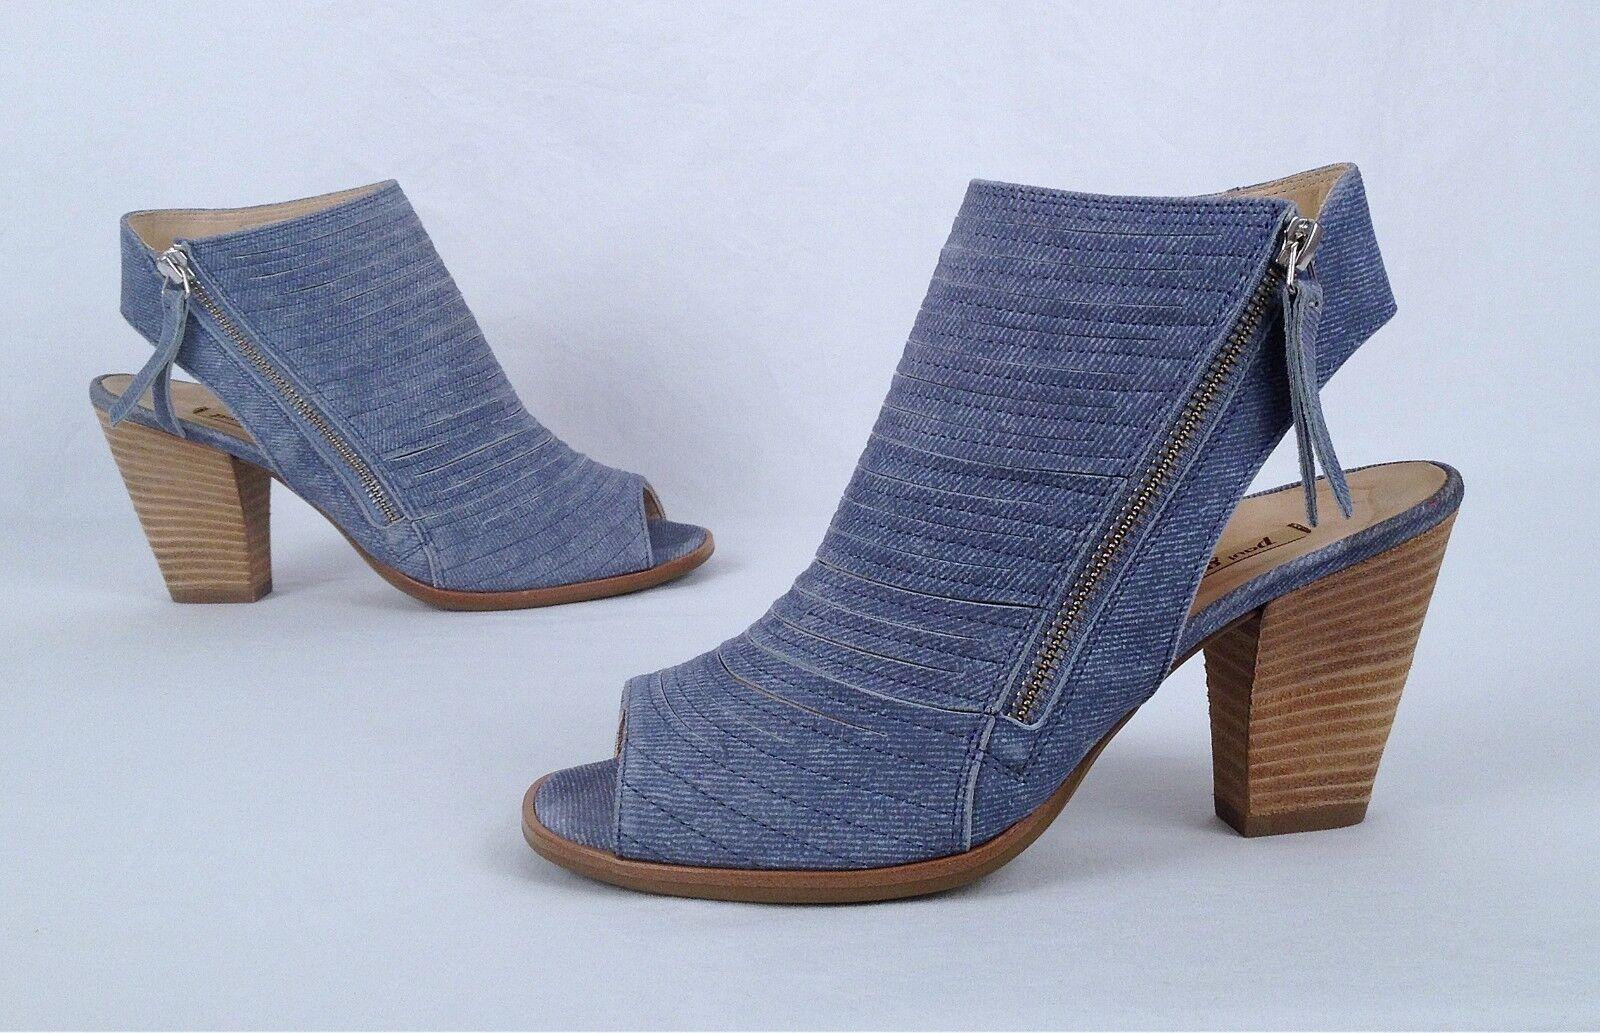 NEW   Paul Green 'Cayanne' Sandal- Denim Suede- Size 6.5 US  4 UK   398  (B5)